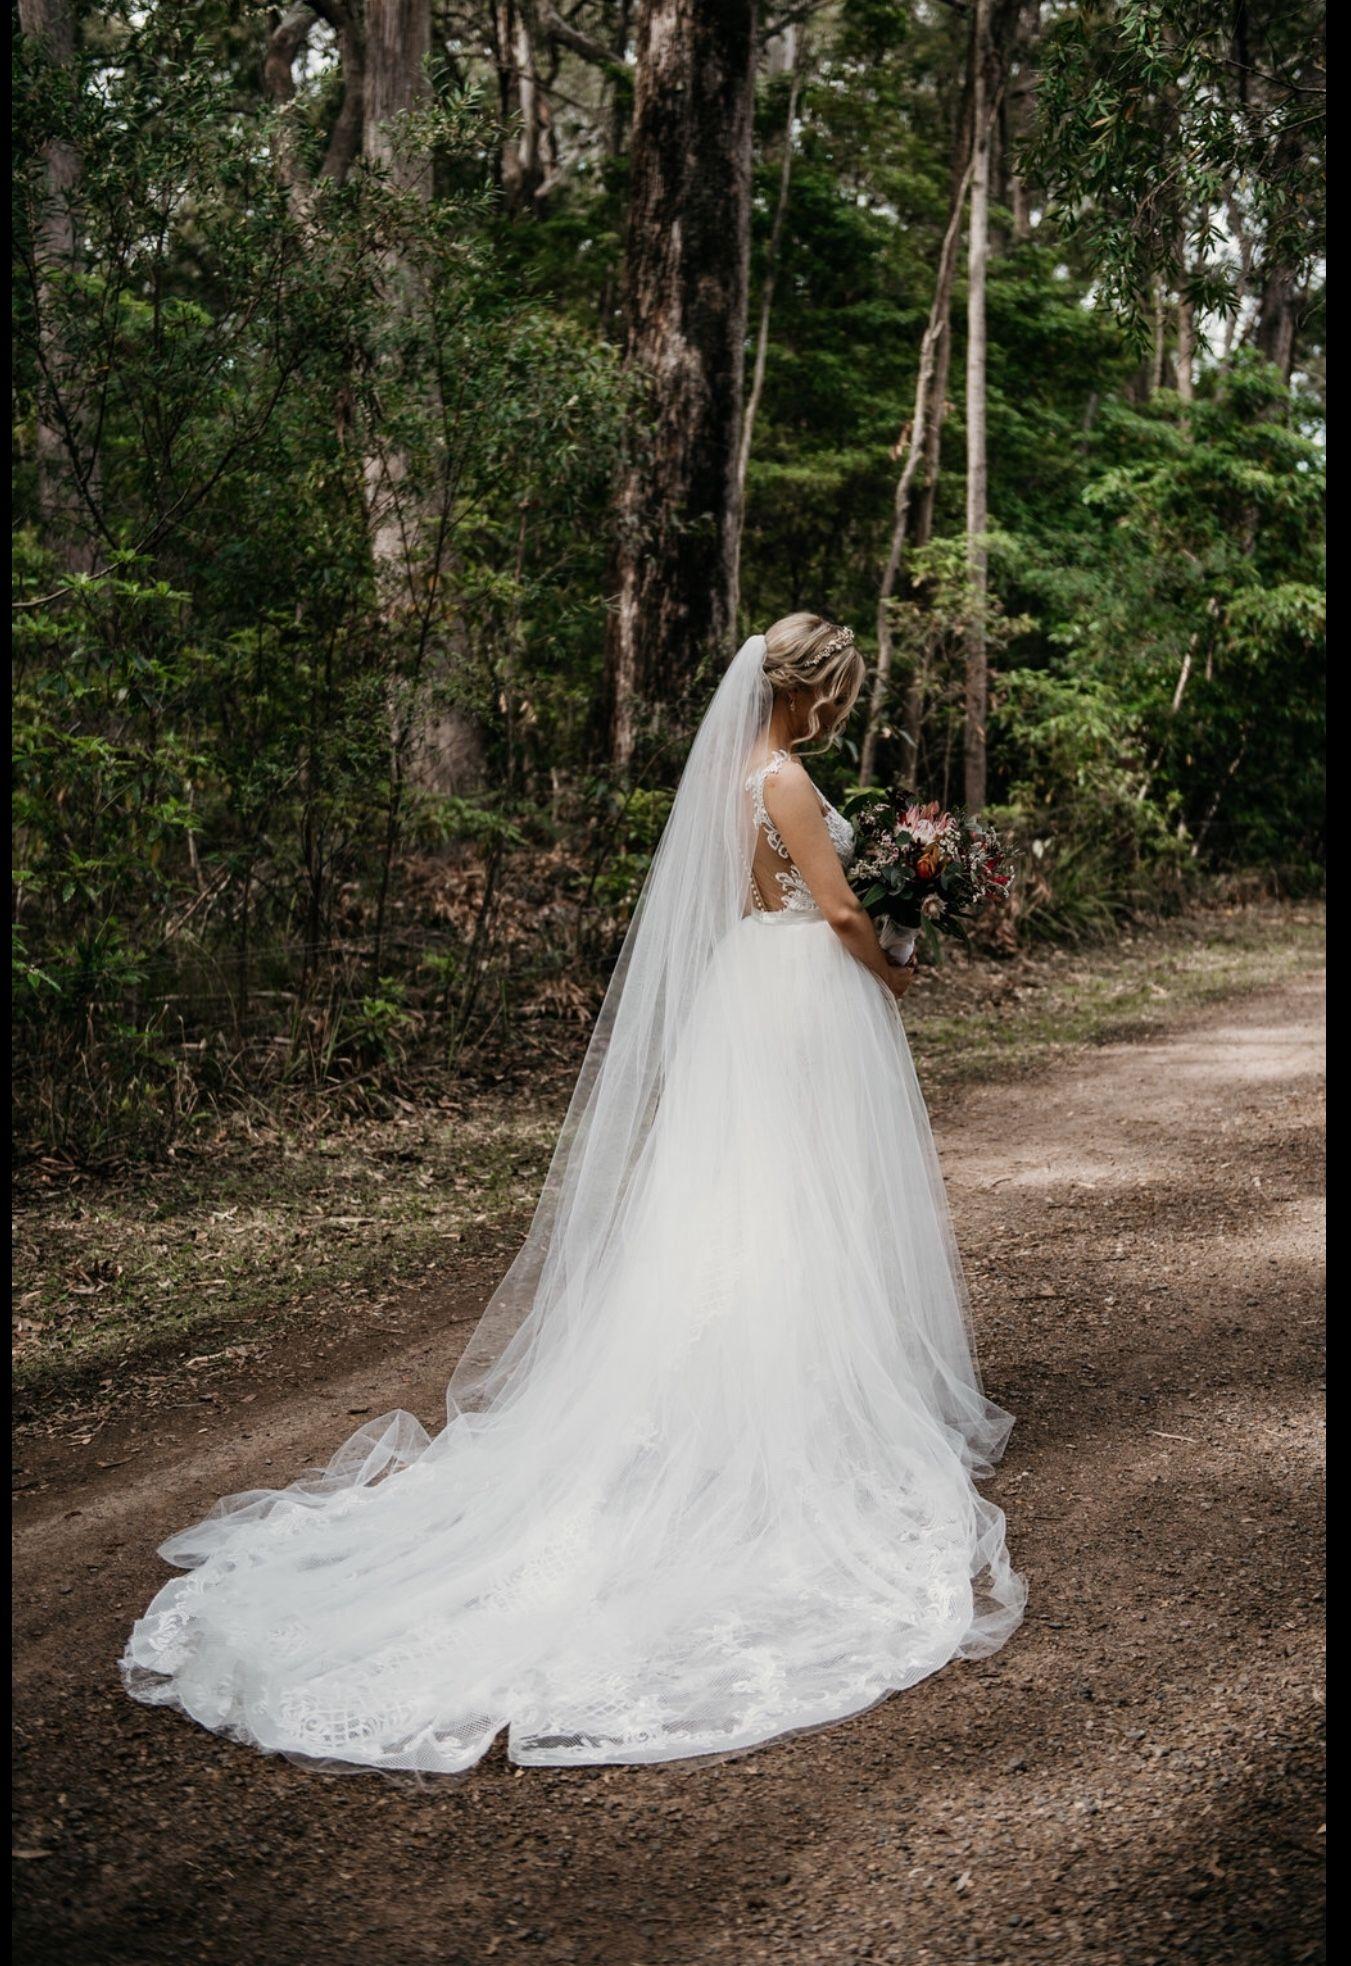 Wedding dress tulle removable skirt tulle overlay